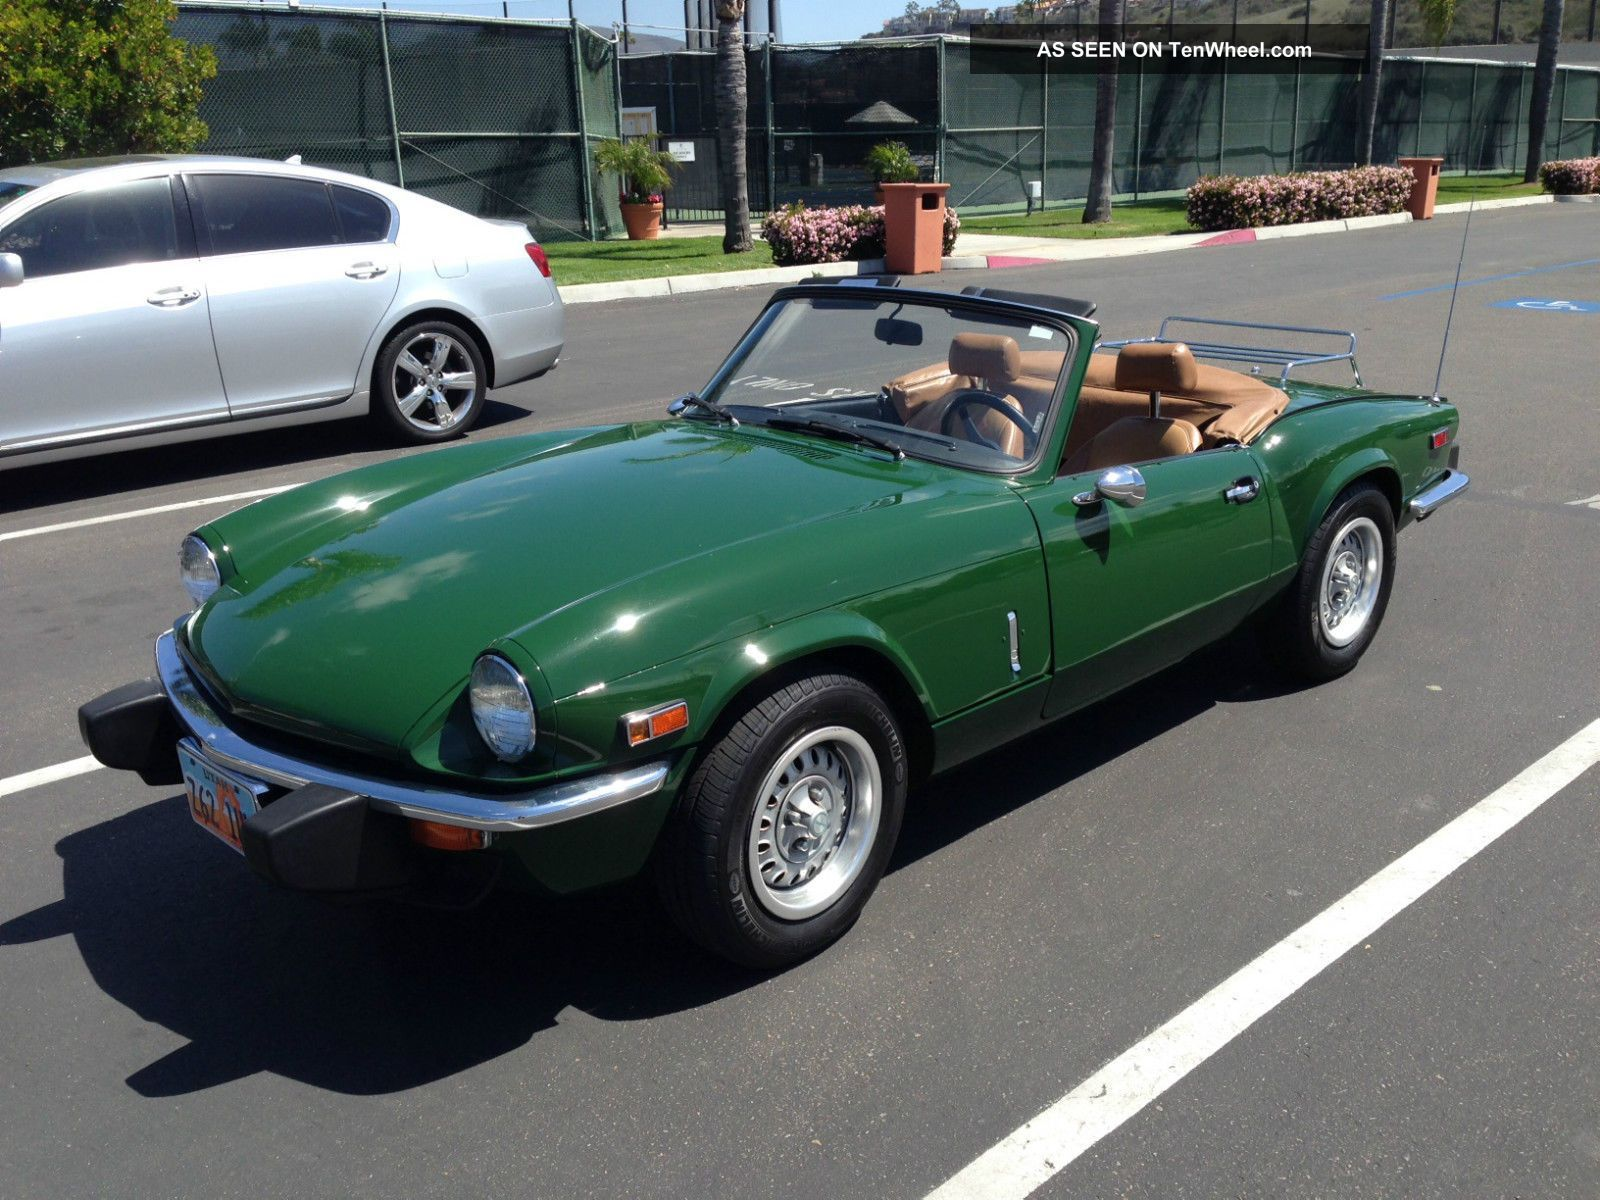 vintage cars 1970s triumph spitfire convertible green tan interior ...